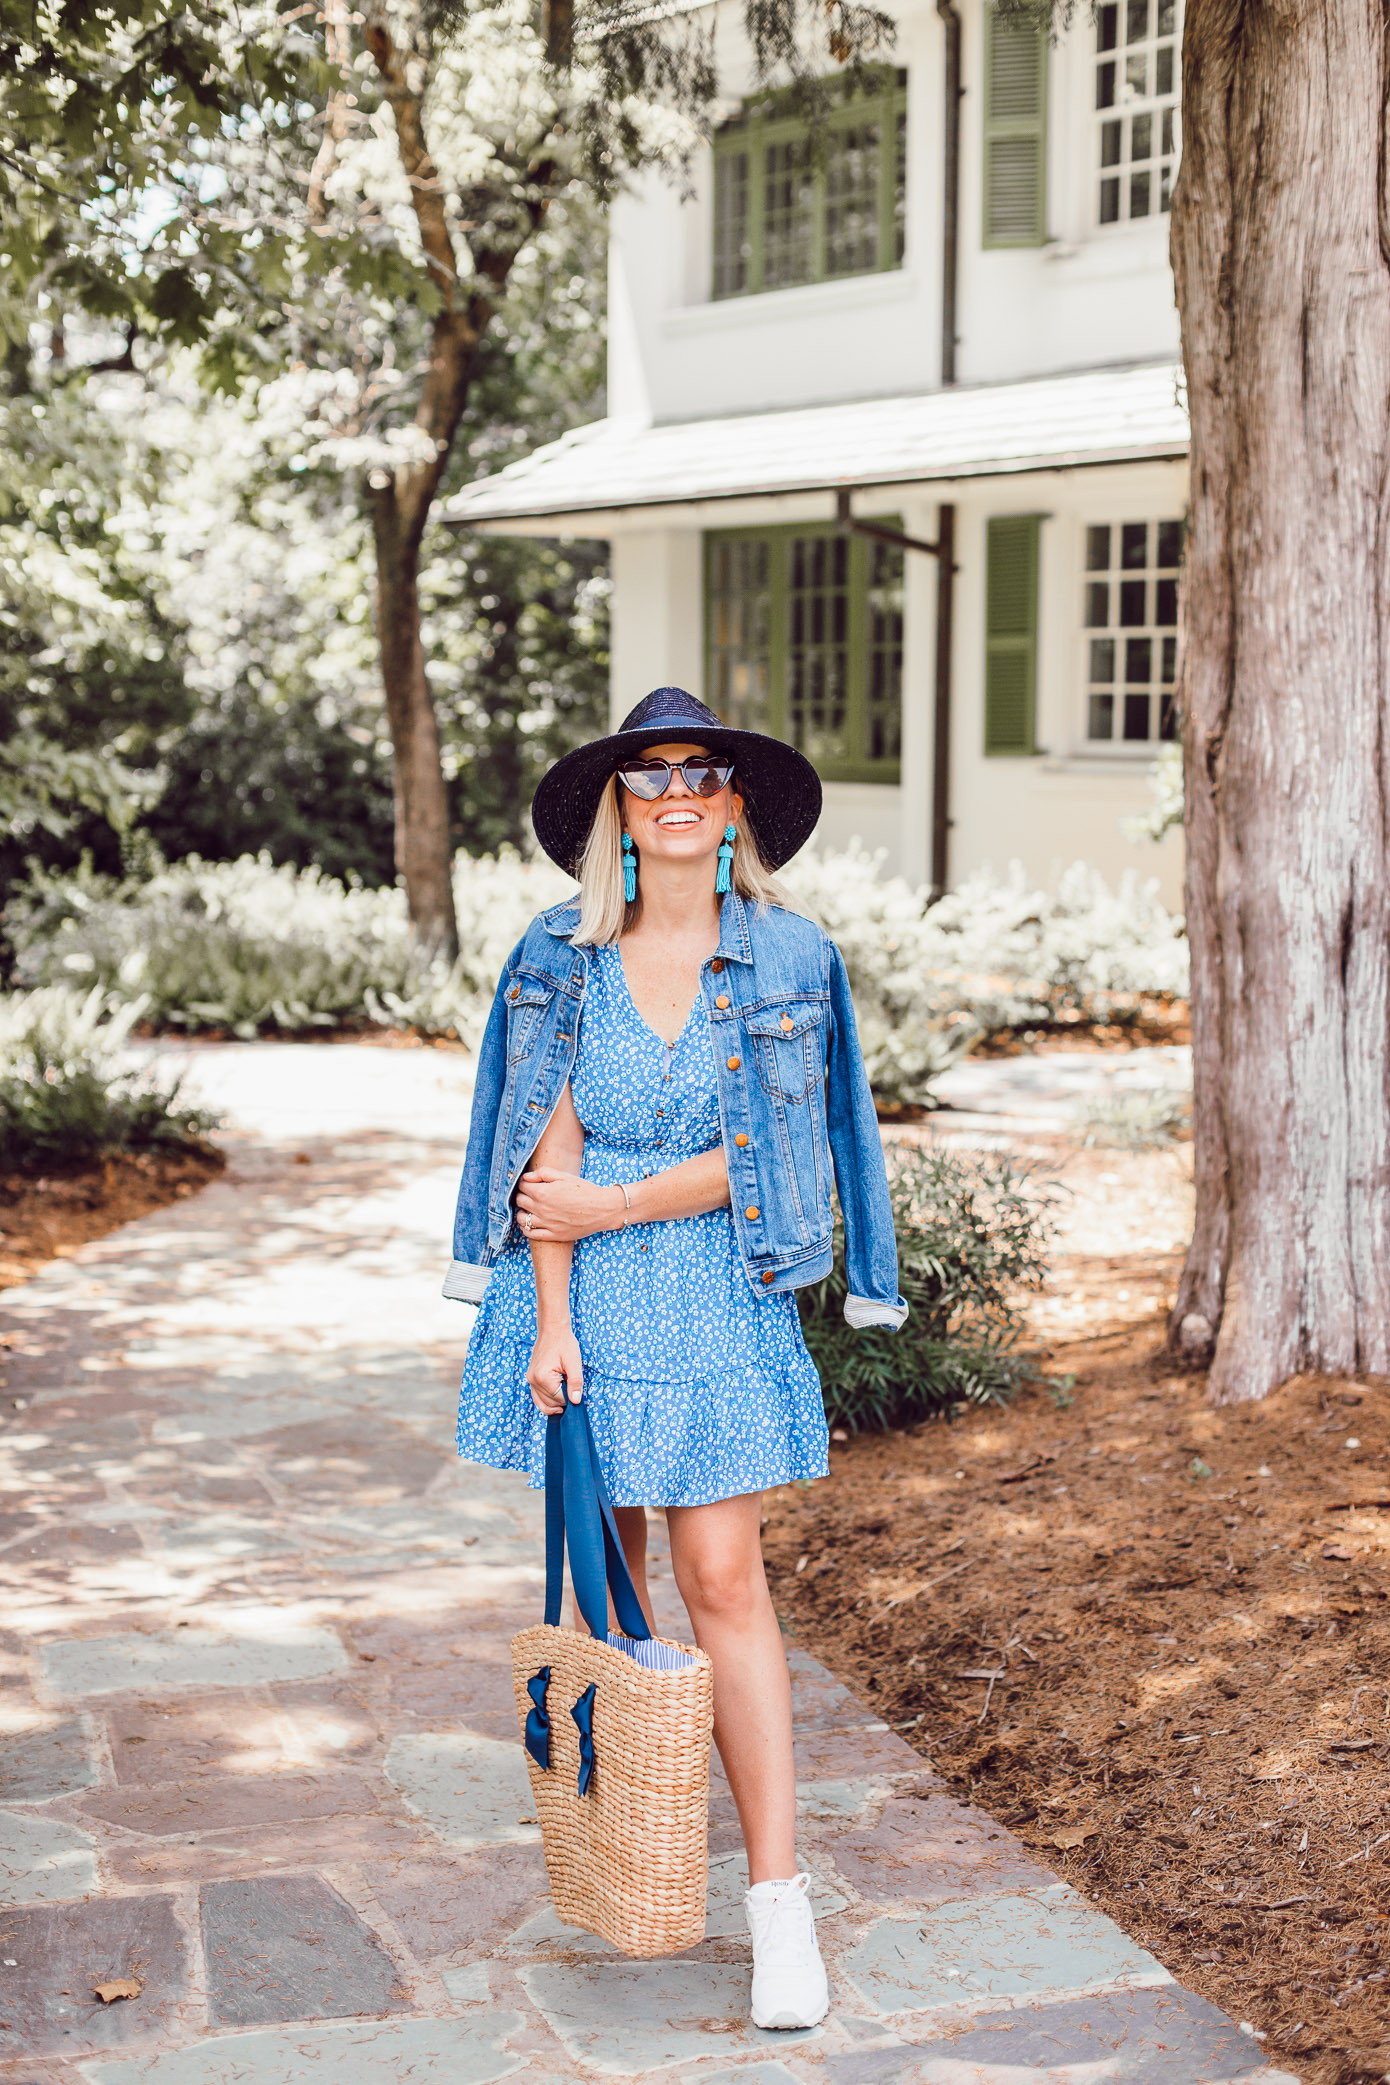 Amazon Fashion Find | Blue Swing Dress under $25, Easy Summer Dresses | Louella Reese